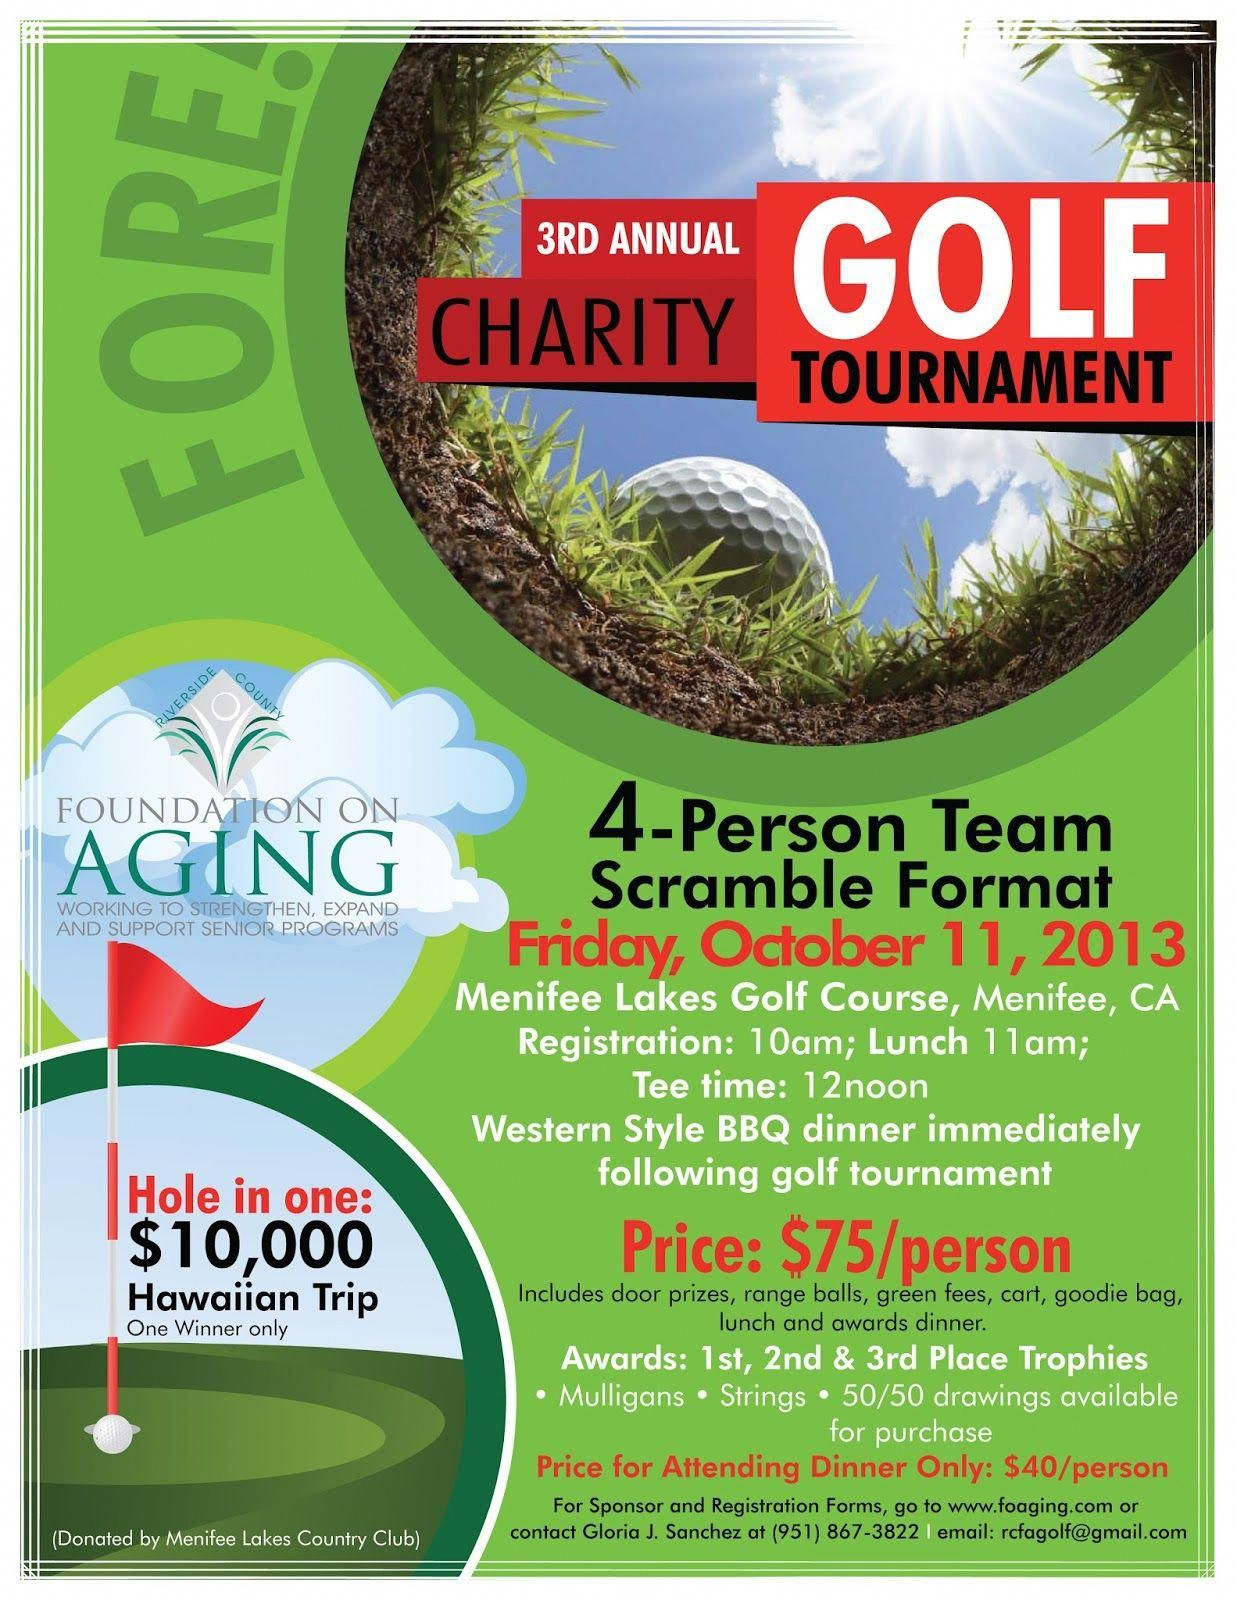 38+ Charity golf fundraiser information